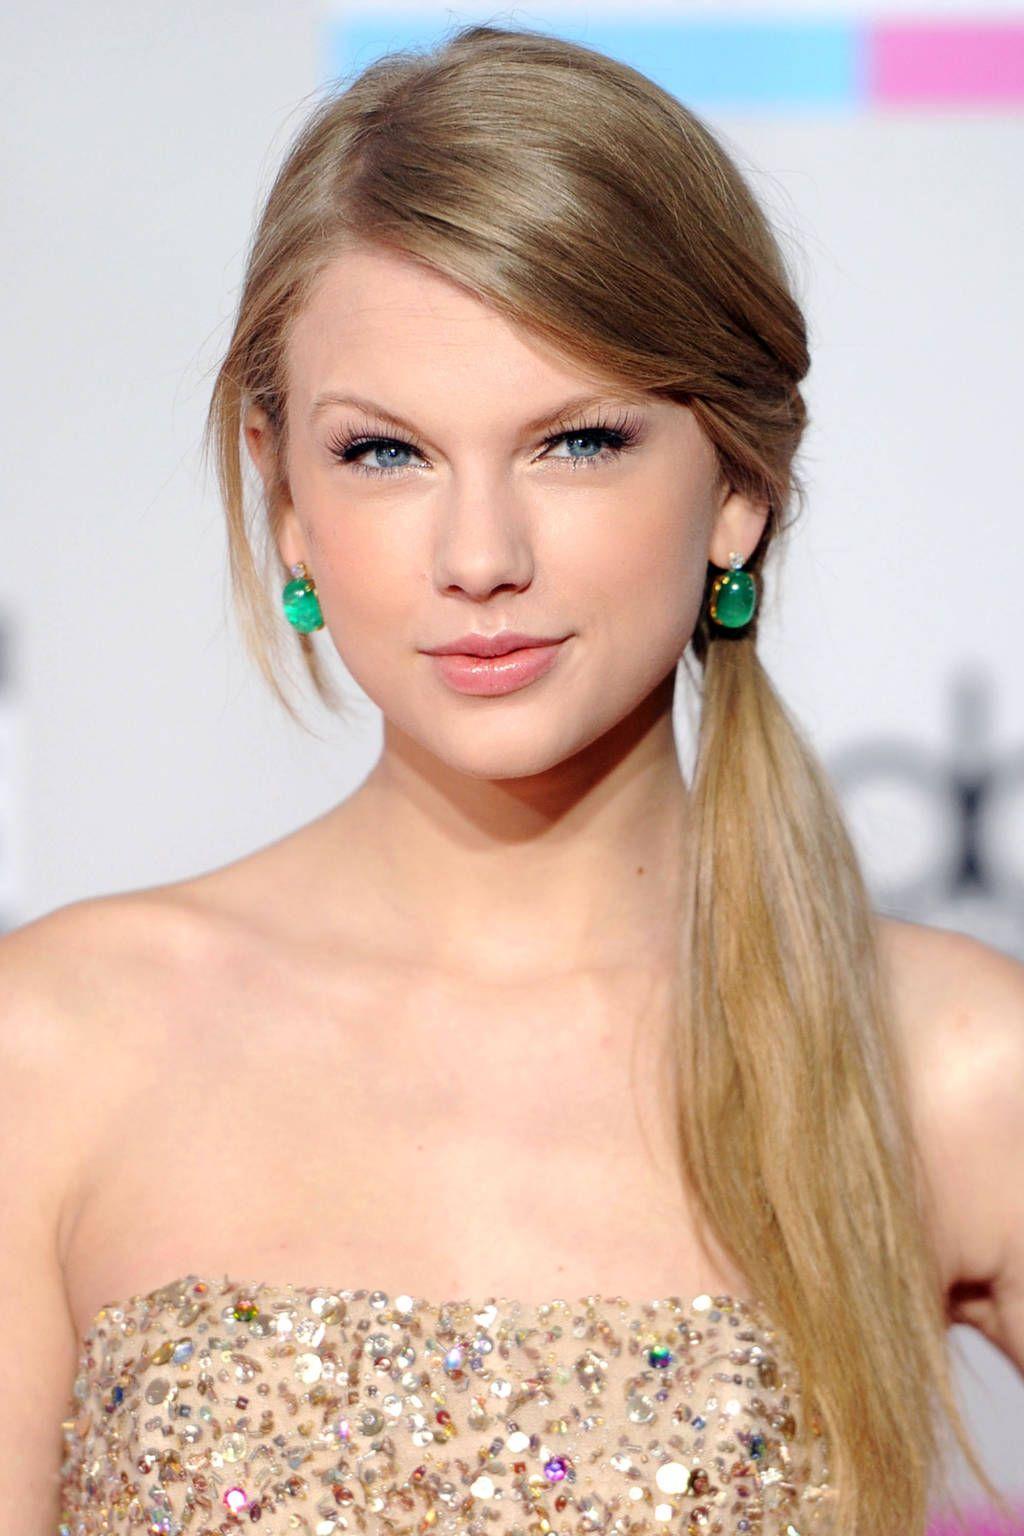 Taylor Swift S Amazing Beauty Transformation Through The Years Taylor Swift Hair Taylor Swift Haircut Long Hair Styles